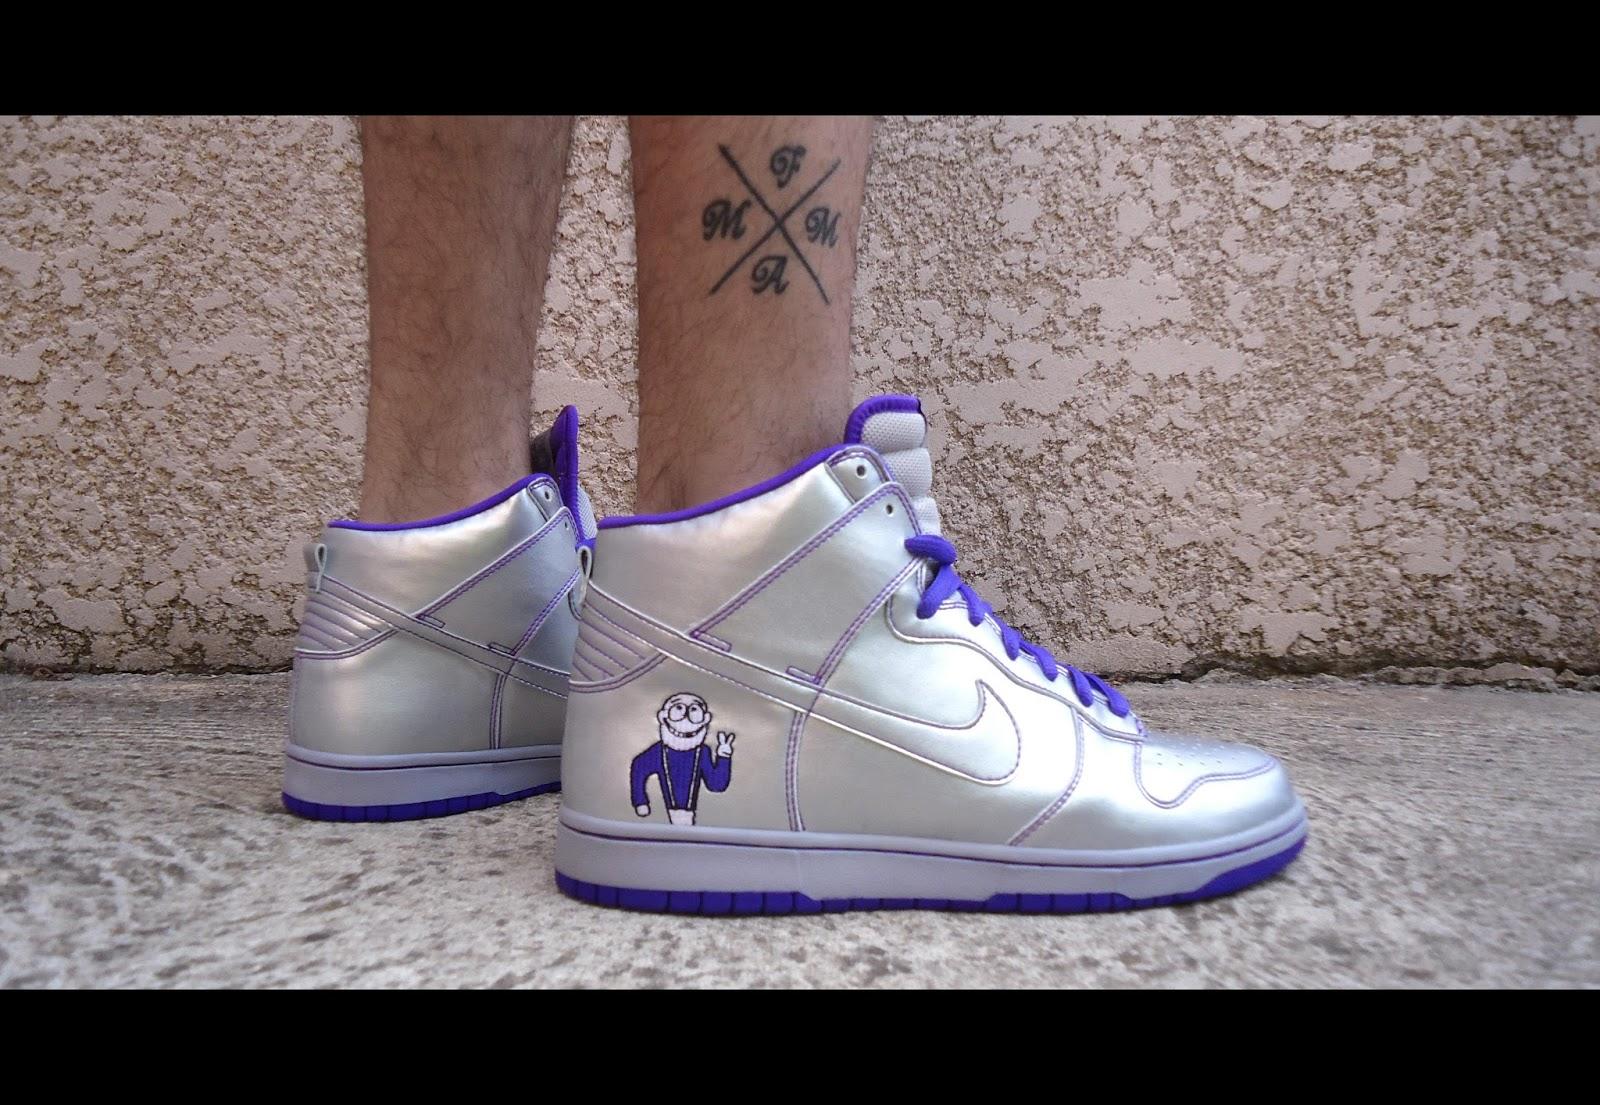 6dd433d9e2 official store nike dunk purple dinosaur jr b25d1 8bf0b